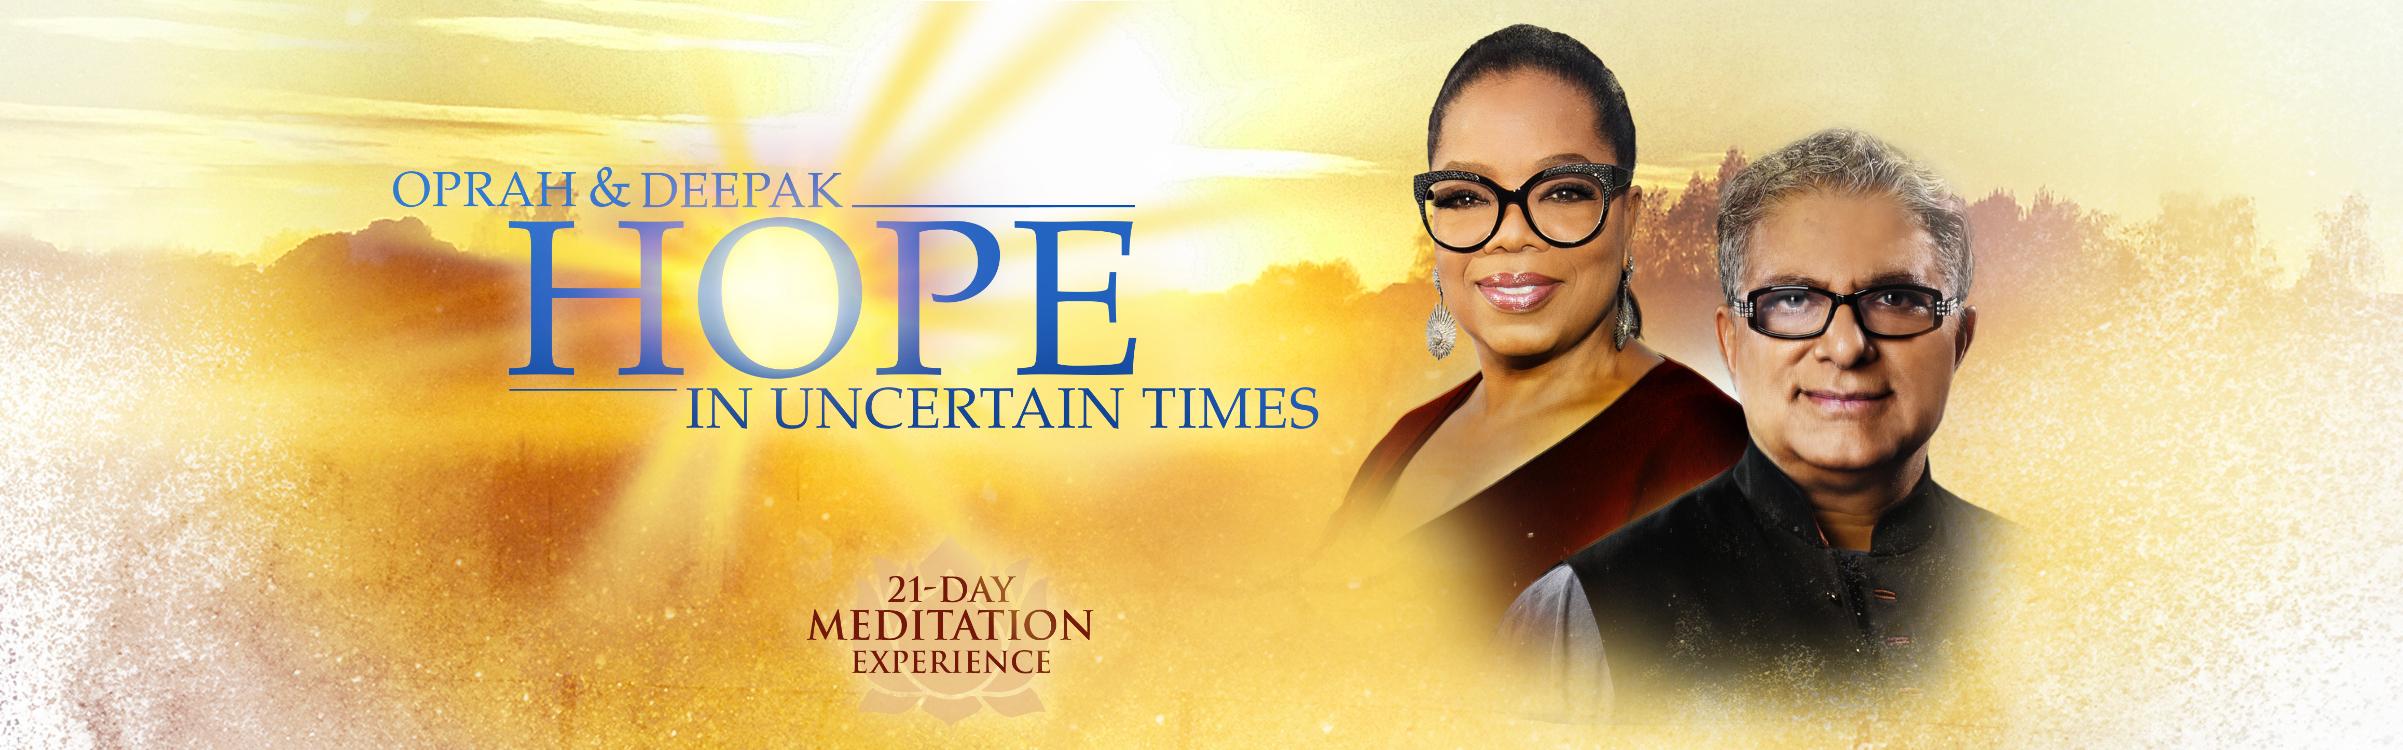 Oprah & Deepak's 21 Day Mediation Experience.jpeg